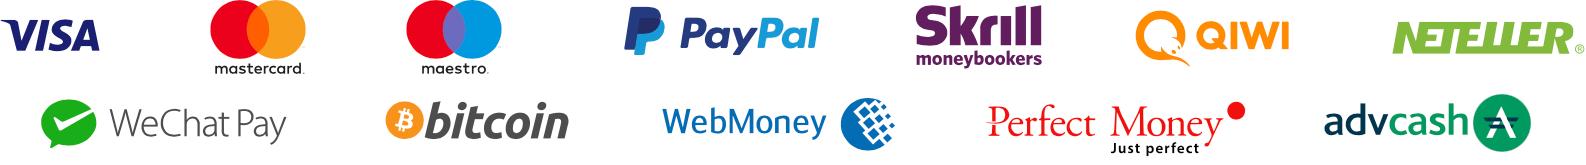 new deposit methods iqoption iqbroker - visa, paypal, skrill, qiwi, neteller, WeChat Pay, bitcoin, WebMoney, Perfect Money, advcash